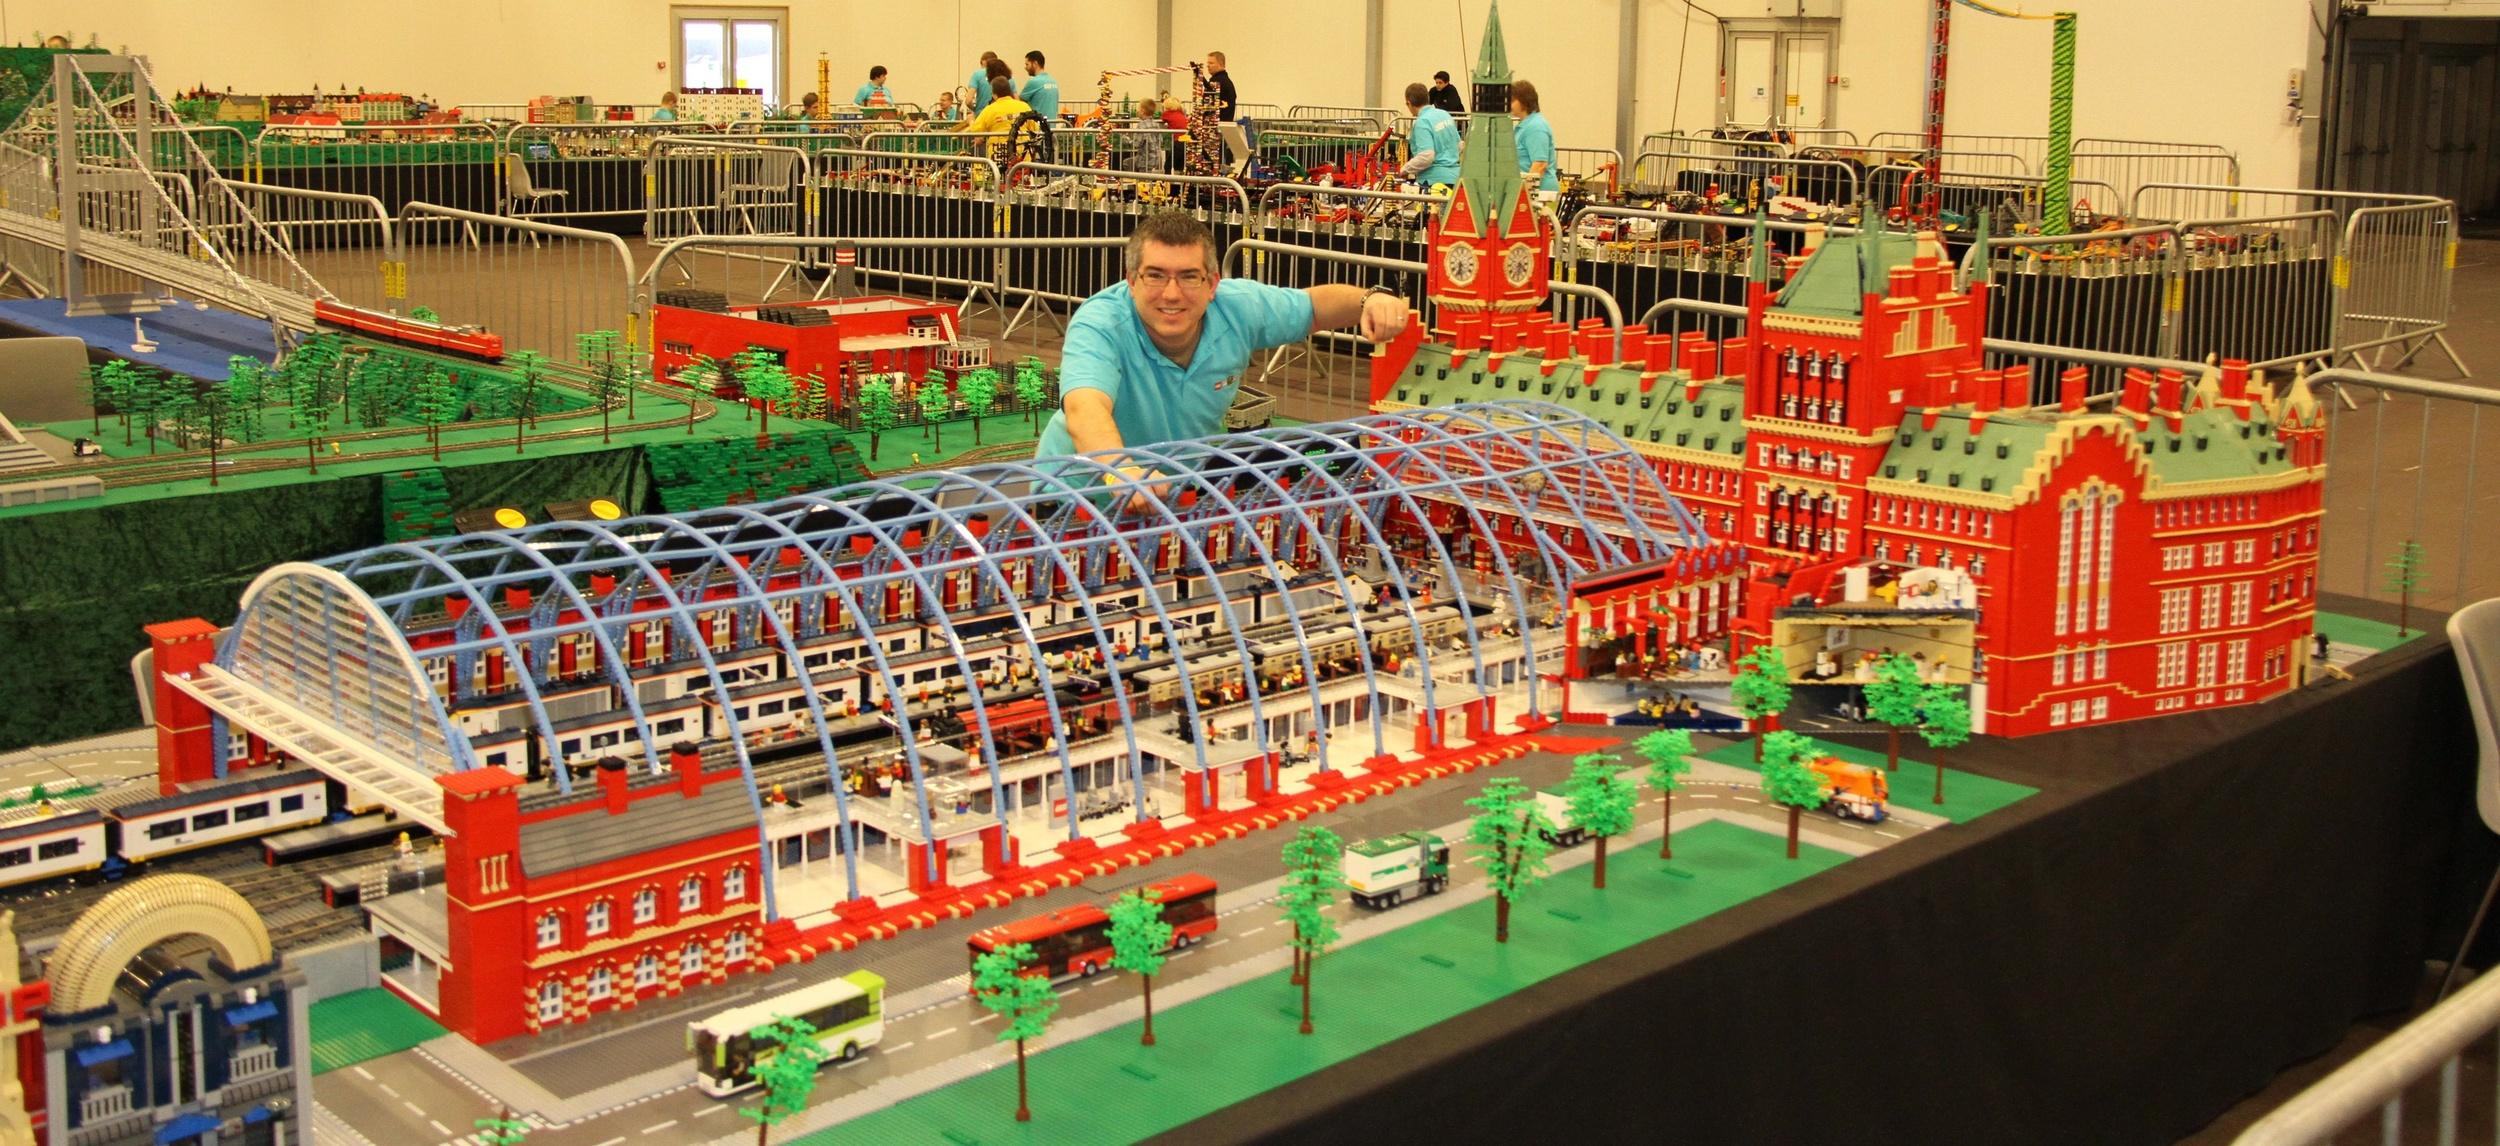 St Pancras Station on display at LEGOWorld Copenhagen